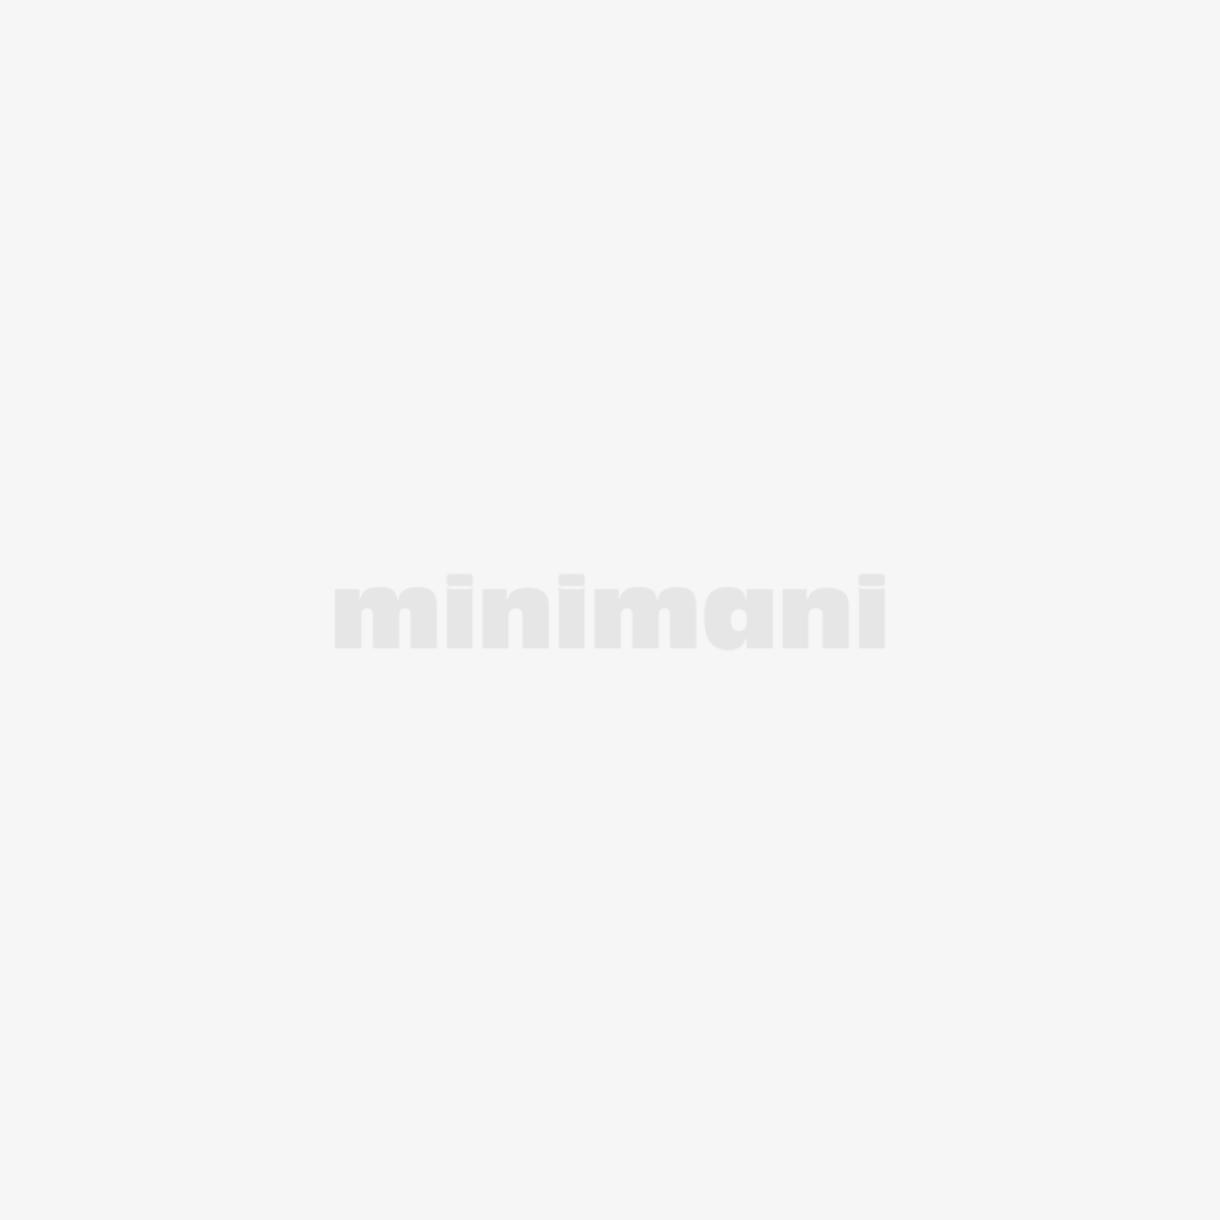 OPAL ANZ577 ASENNUSKAAPELI MK2,5 HARMAA 25M